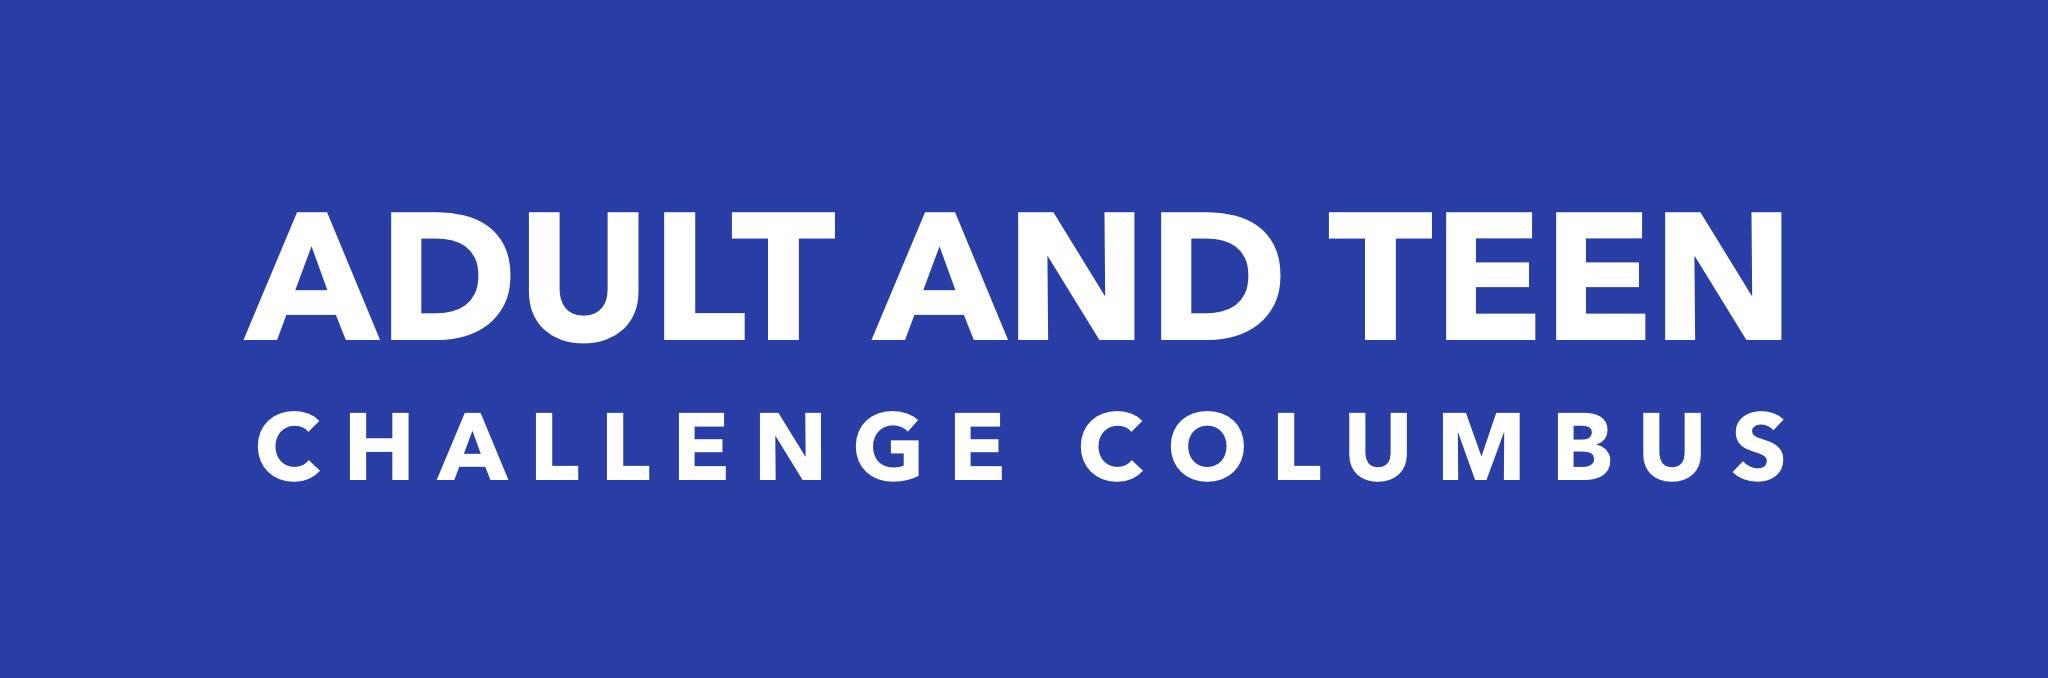 ADULT AND TEEN CHALLENGE COLUMBUS